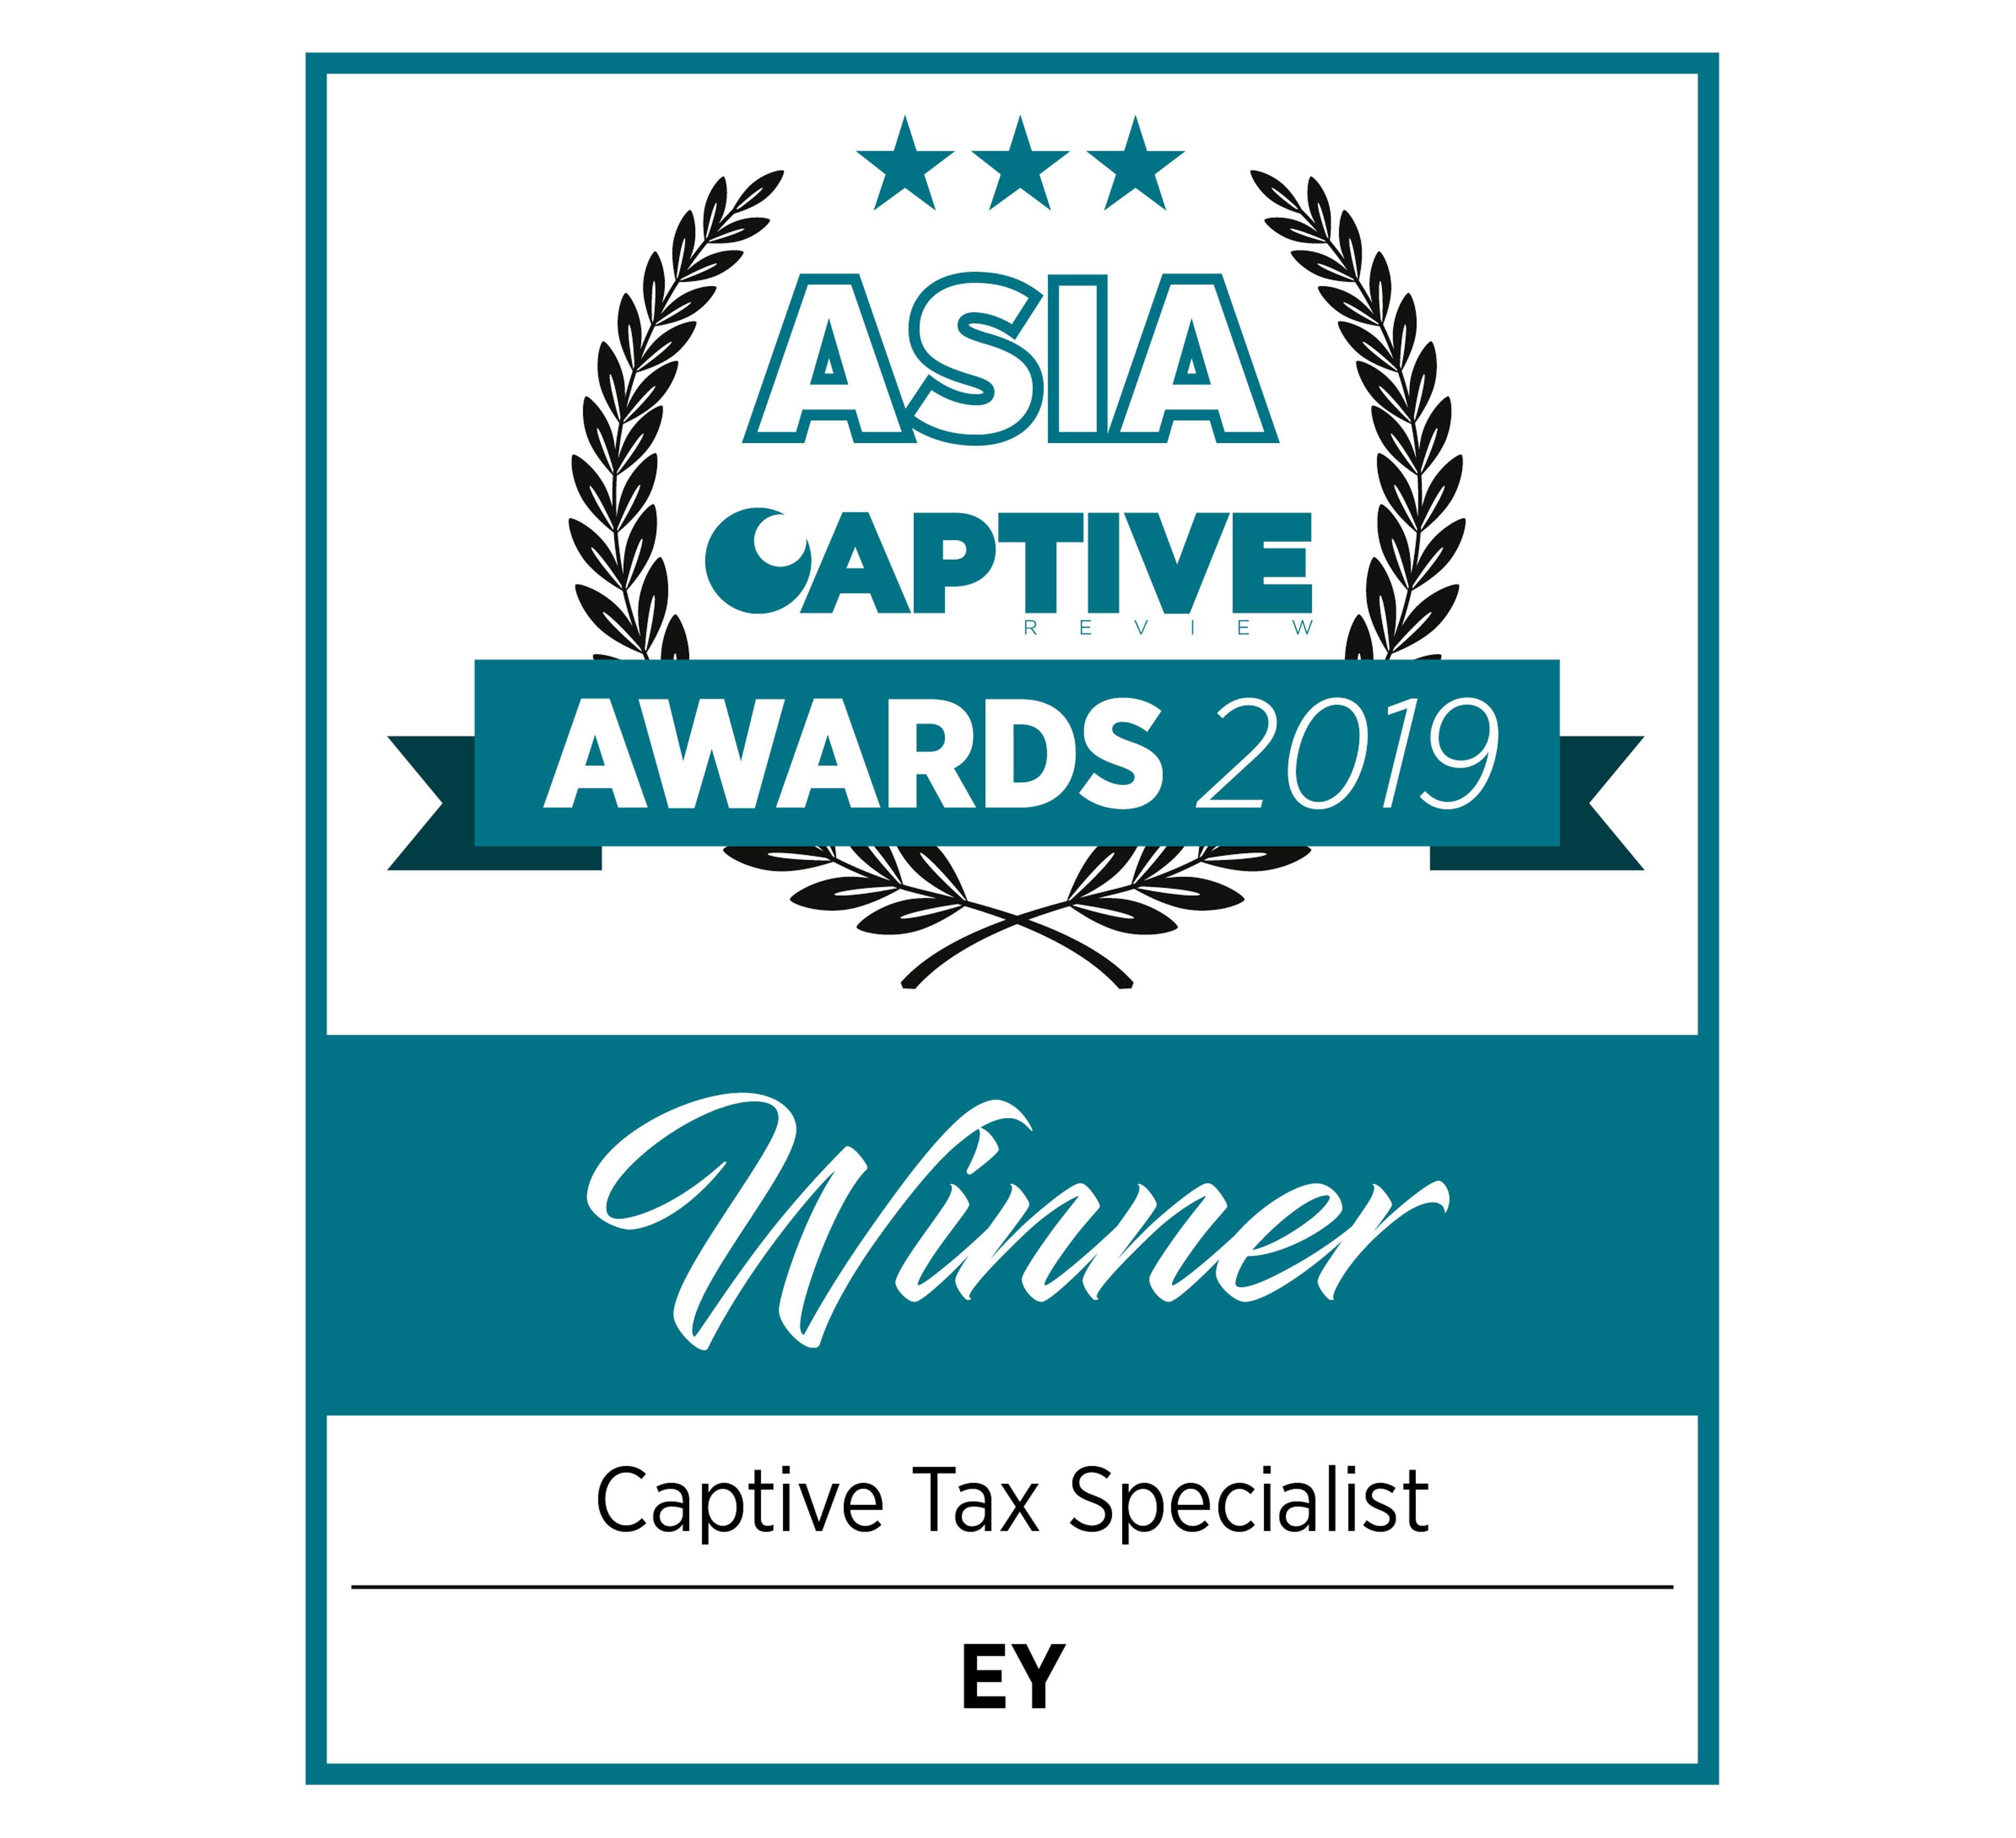 Asia Captive Awards 2019 Winner Captive Tax Specialist EY